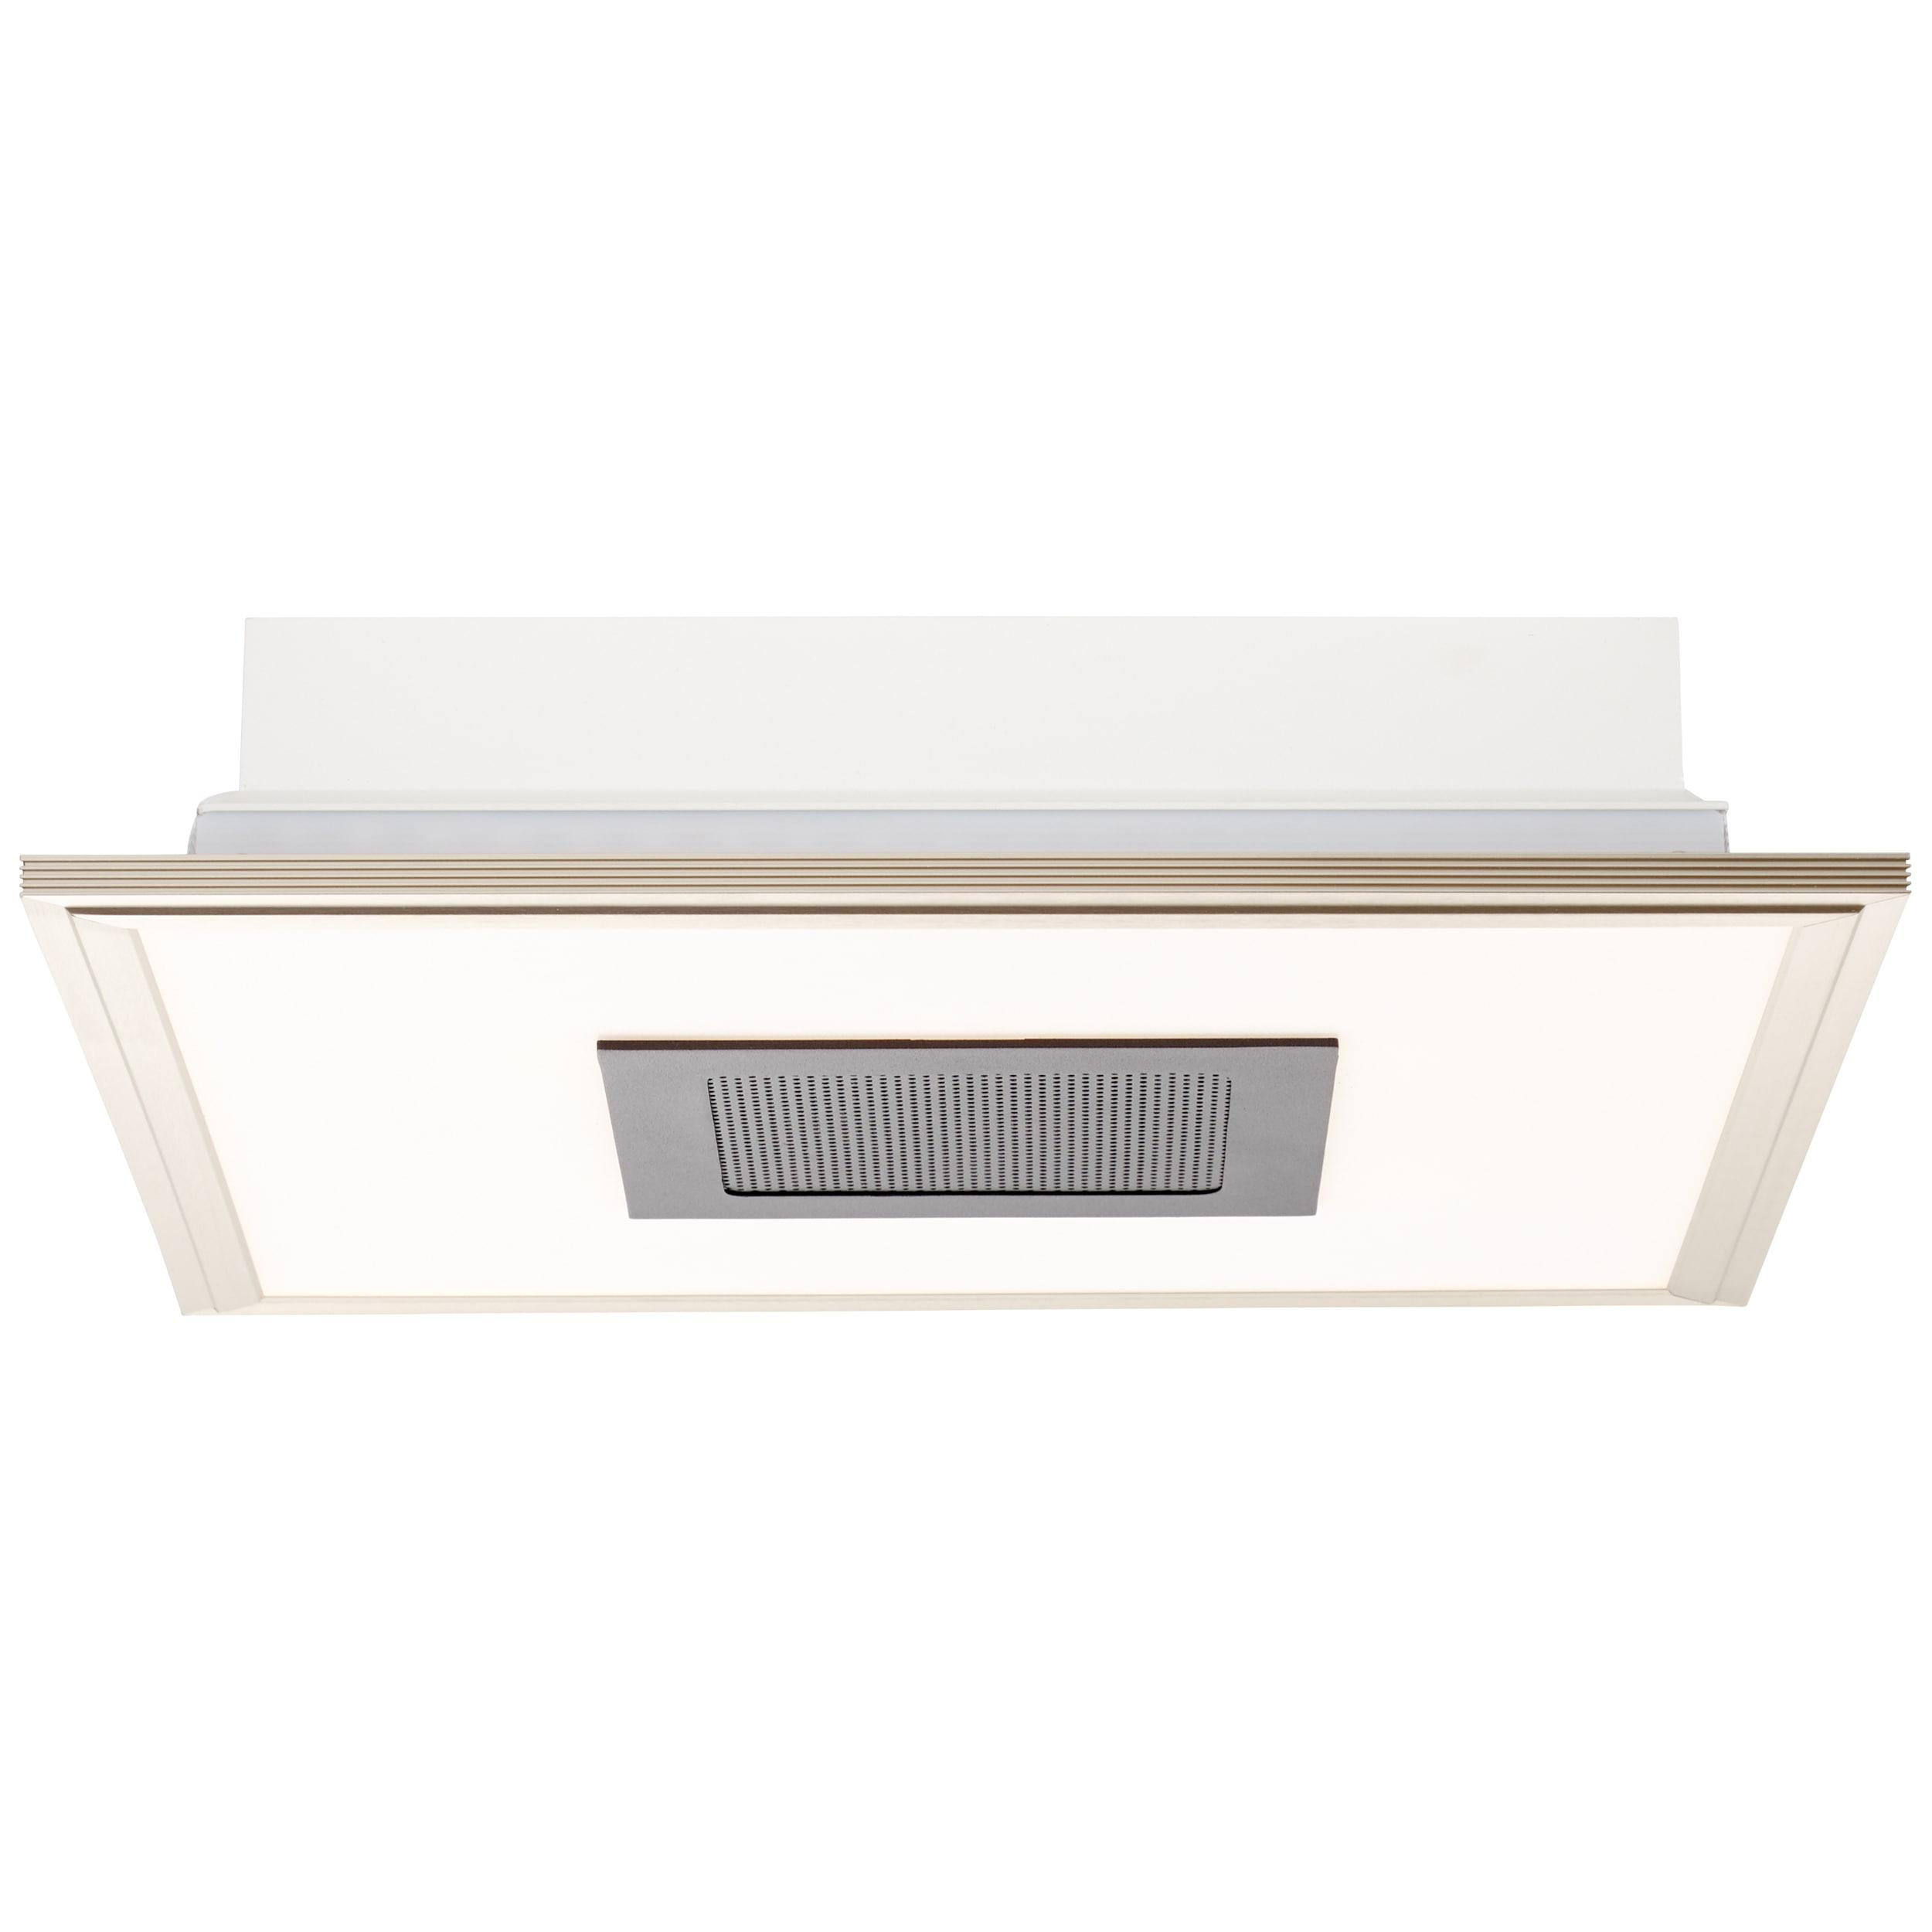 AEG Niven LED Deckenaufbau-Paneel 42x42cm Lautsprecher nickel